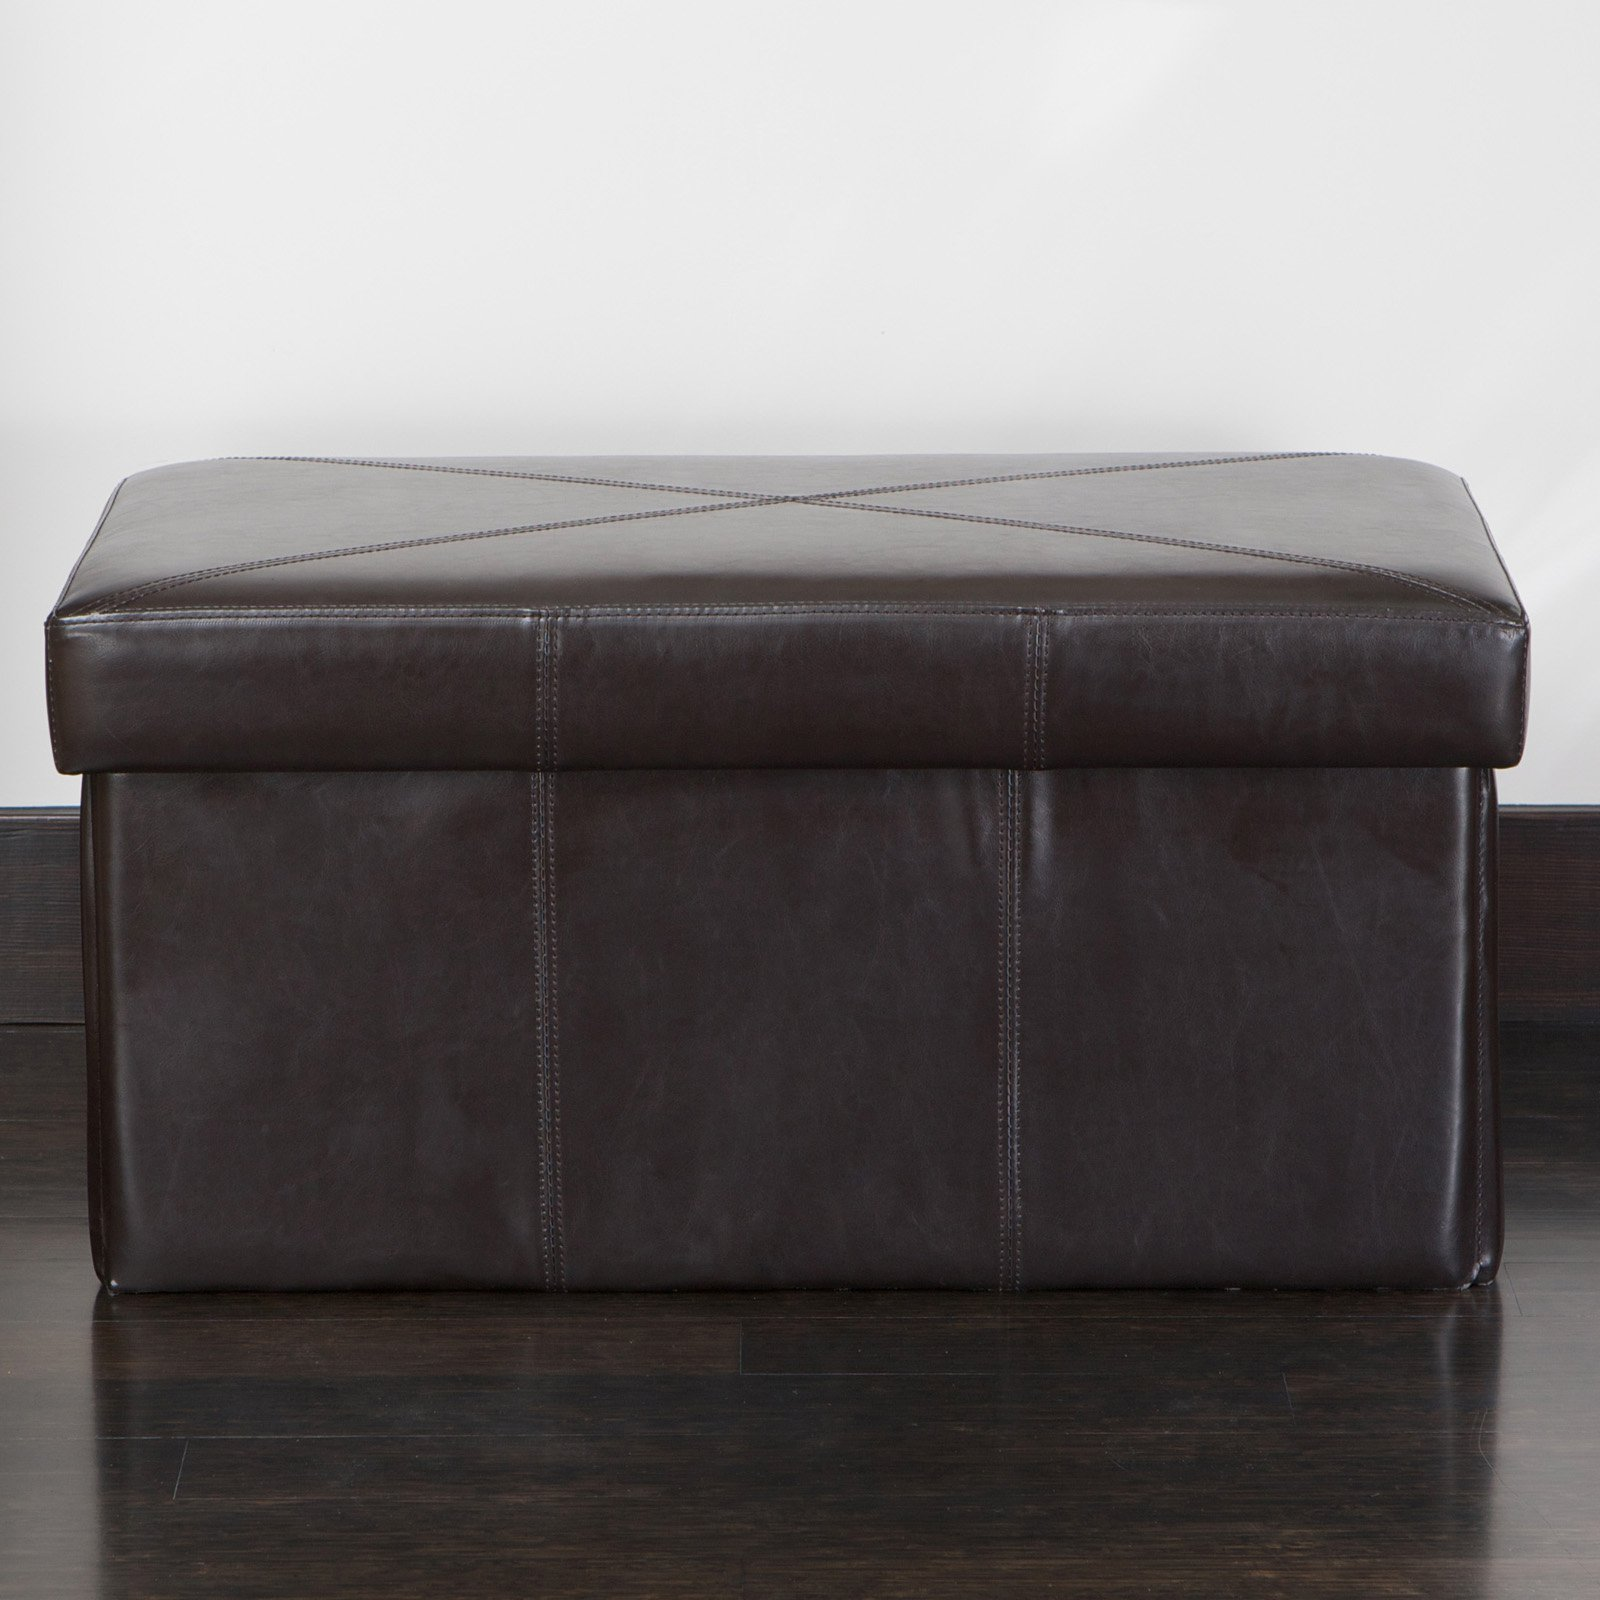 Nottingham Leather Folding Storage Ottoman Bench